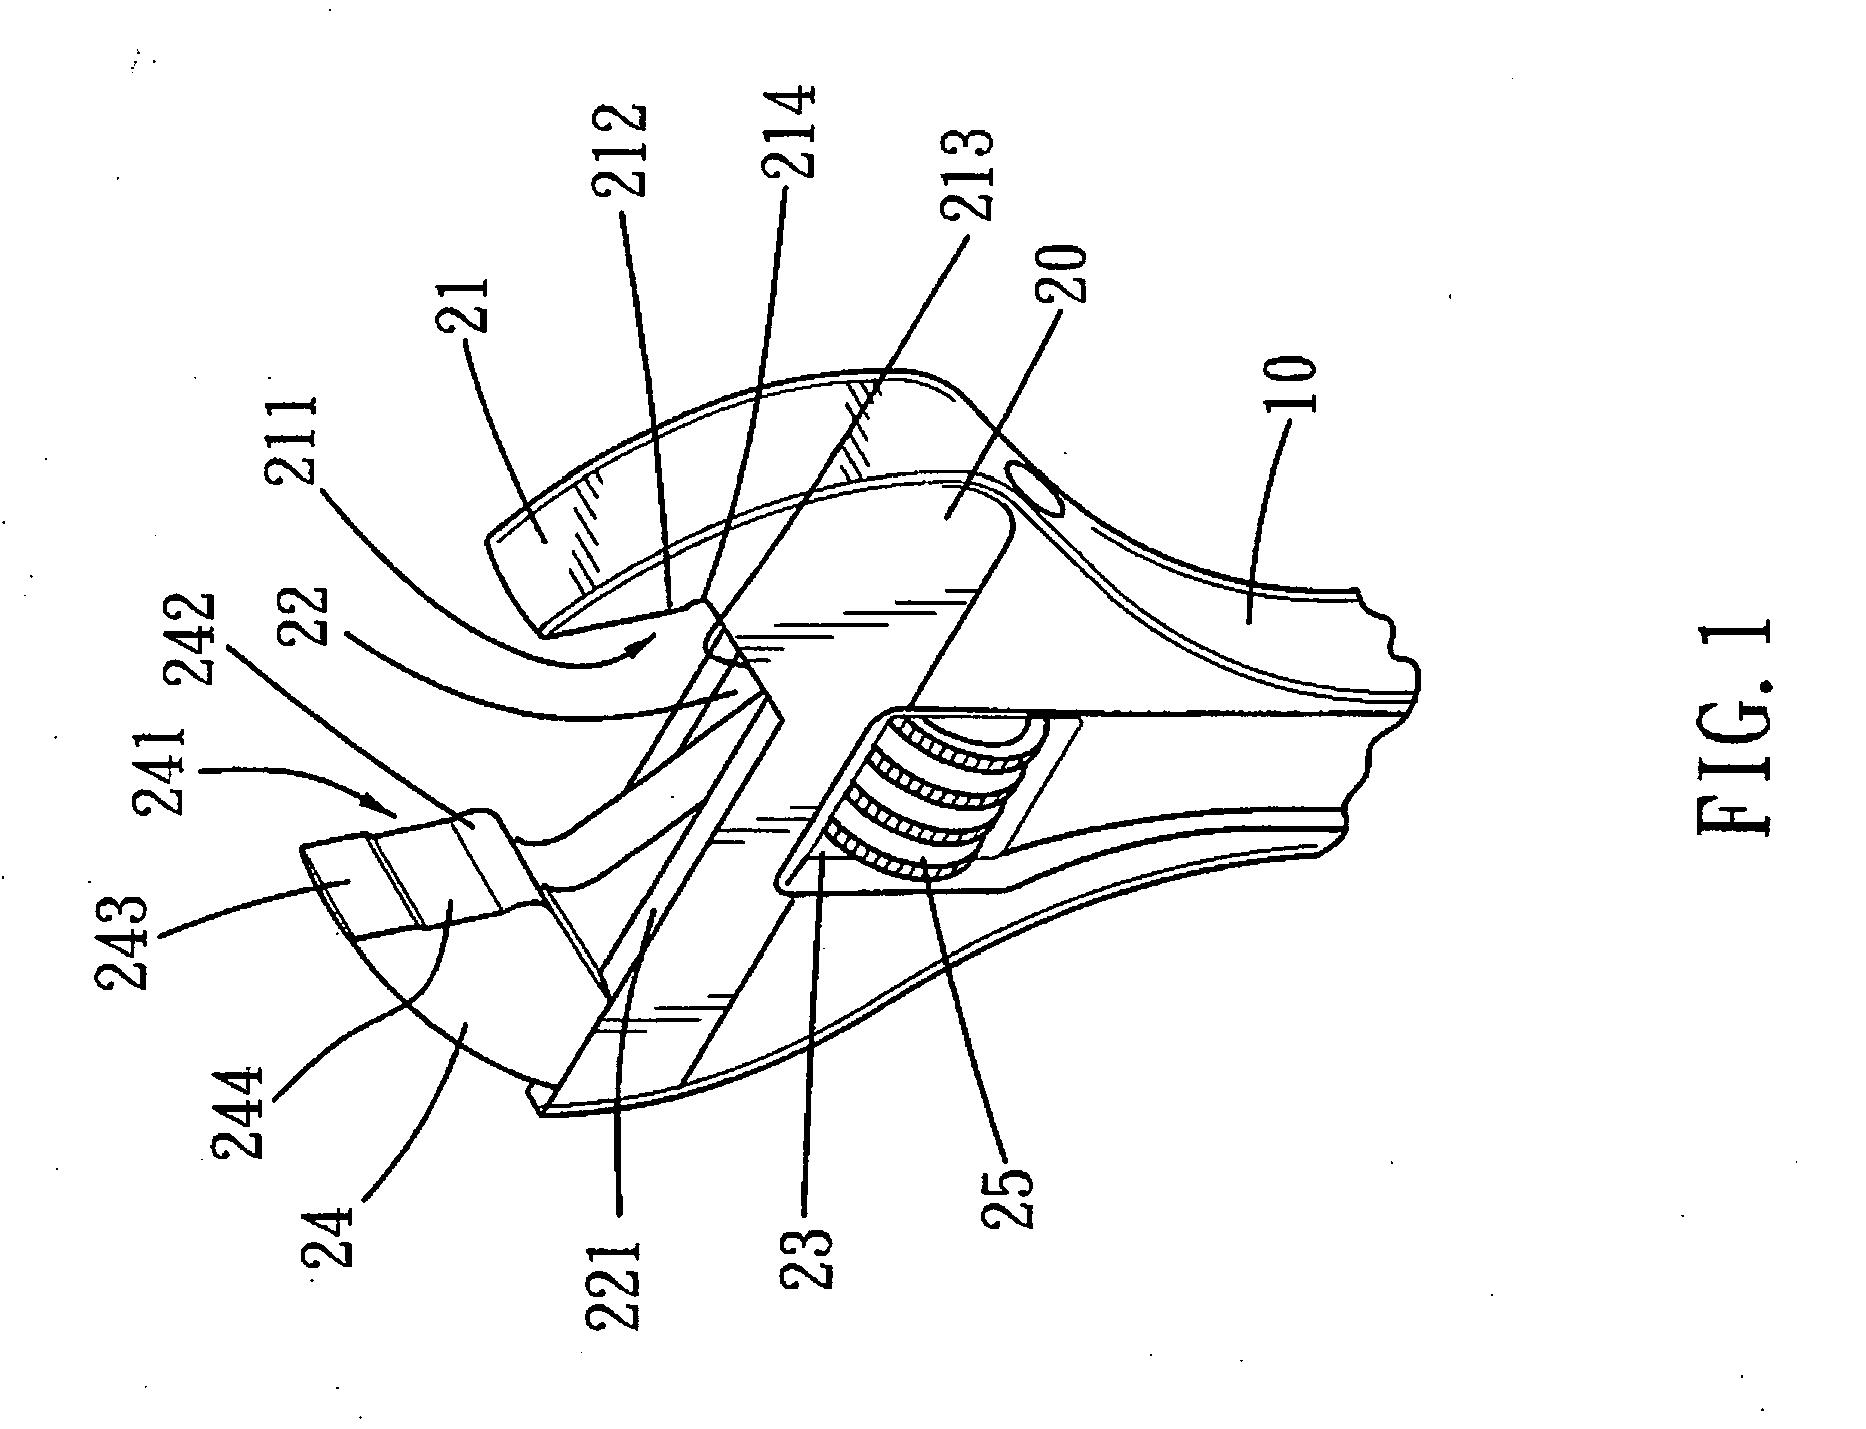 Patent Ep1918070b1